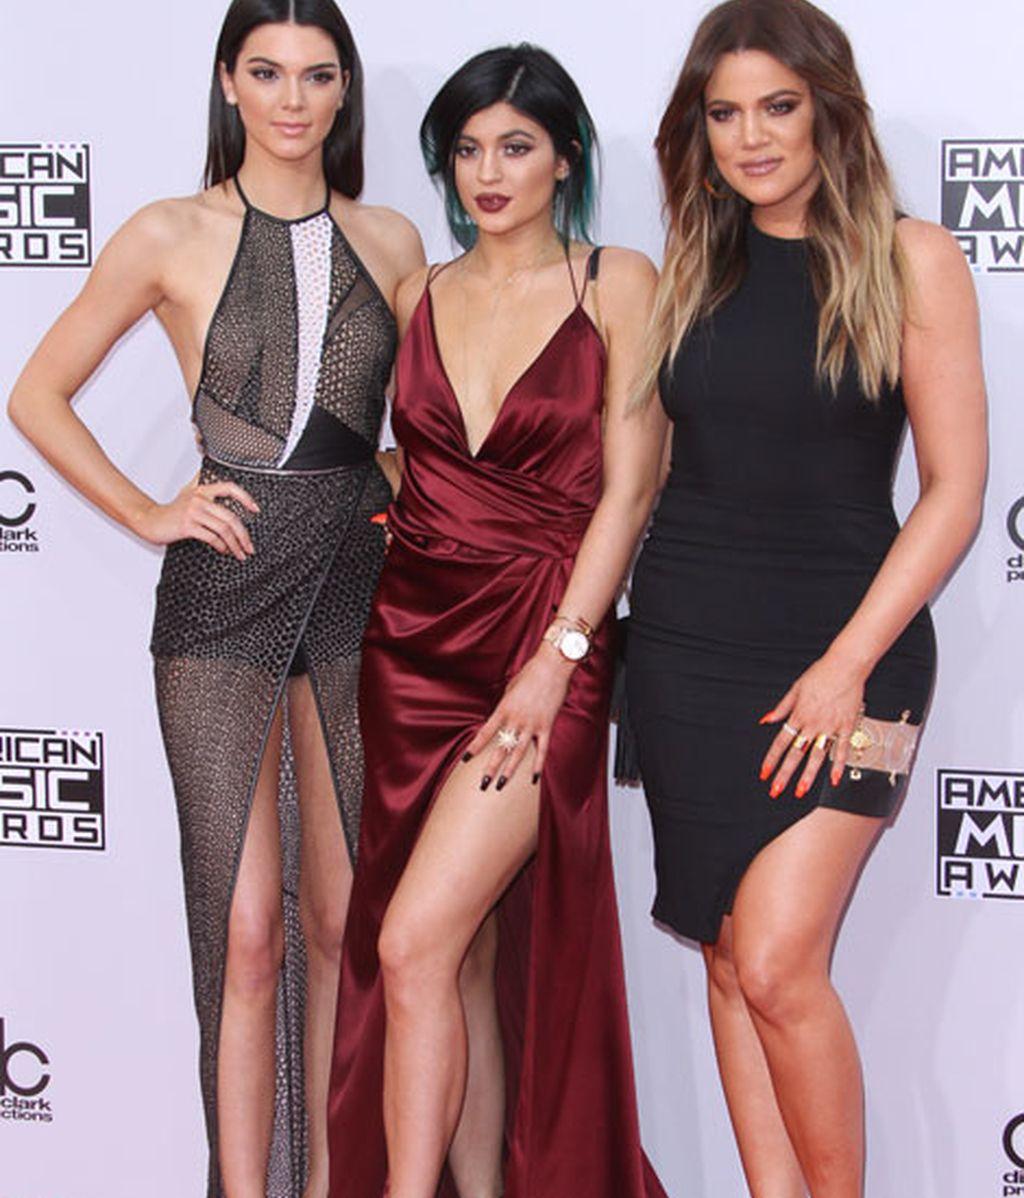 Kendall Jenner, Kylie Jenner y Khloe Kardashian, las hermanas posaron juntas